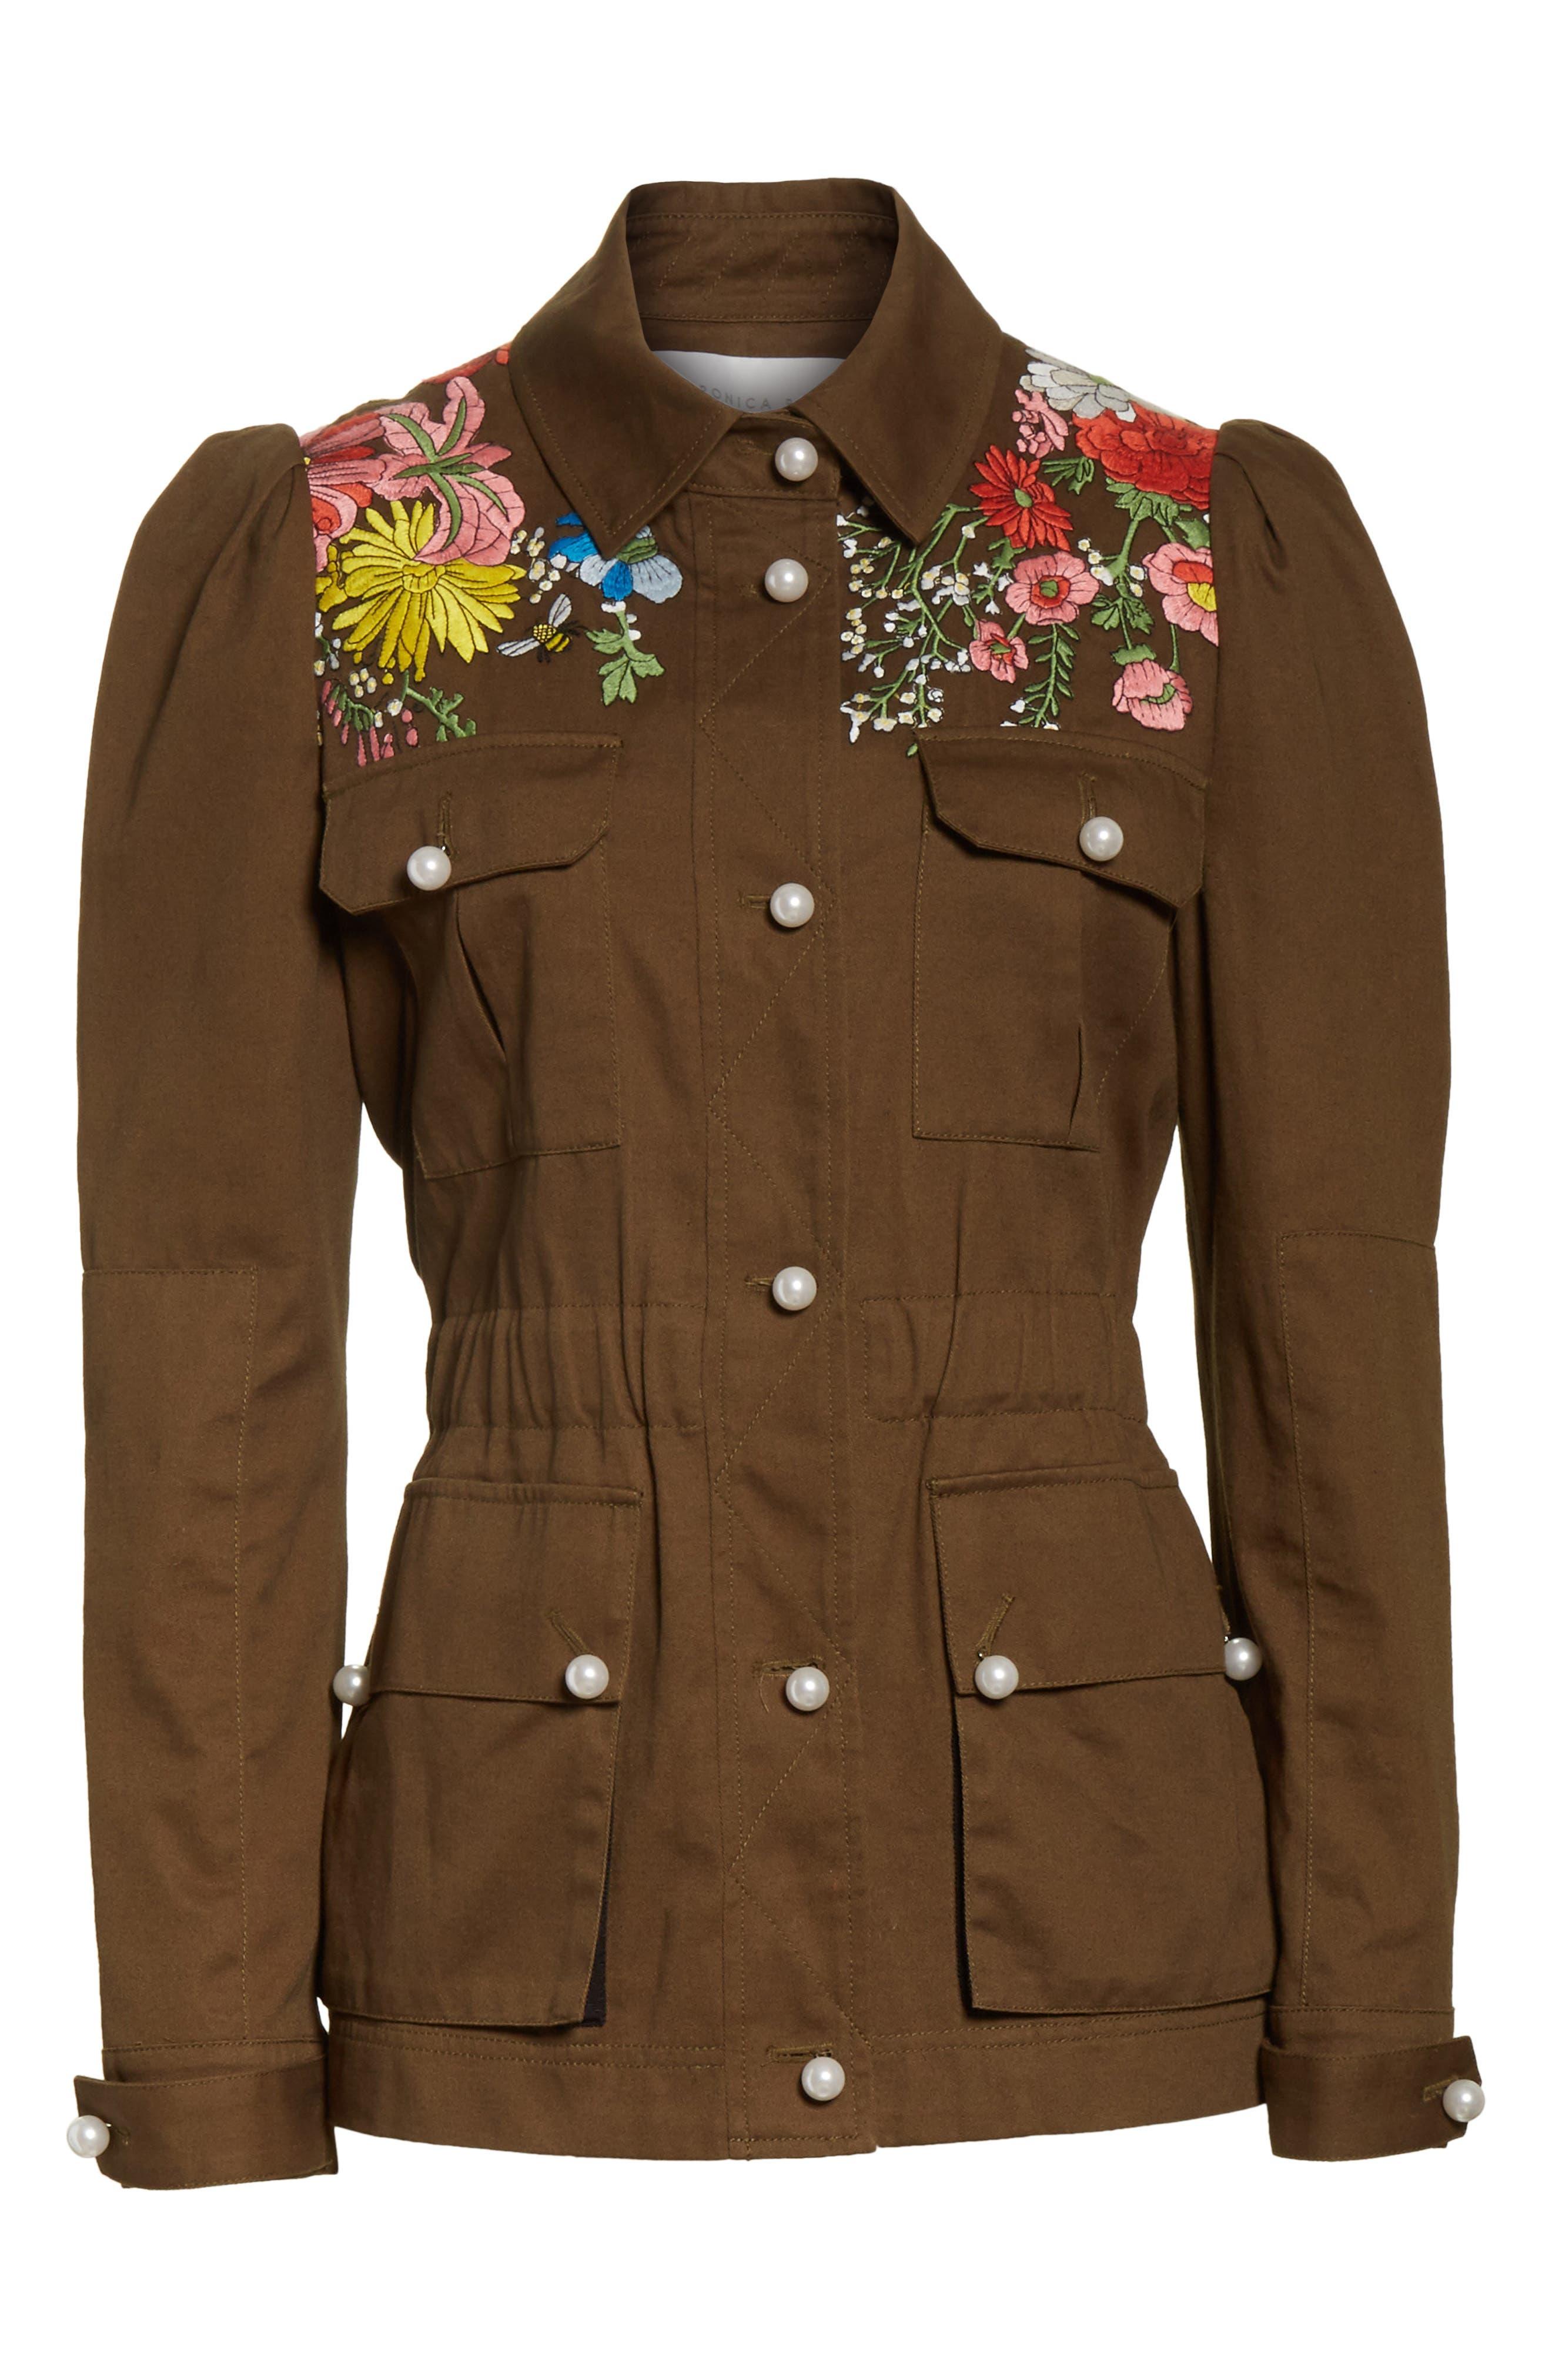 Huxley Floral Embroidered Safari Jacket,                             Alternate thumbnail 5, color,                             310